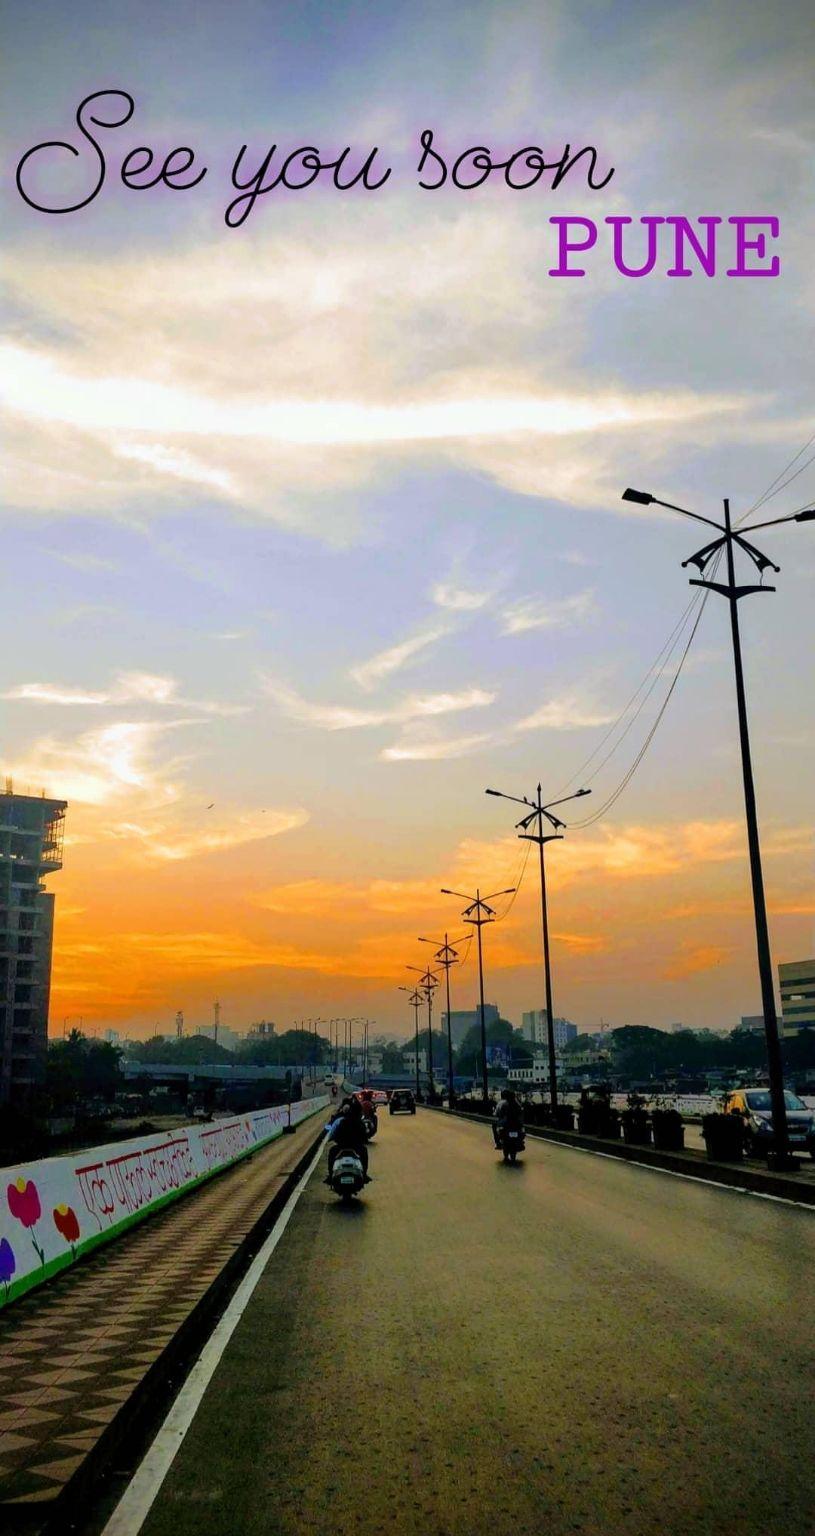 Photo of Pune By Devadutta Deb